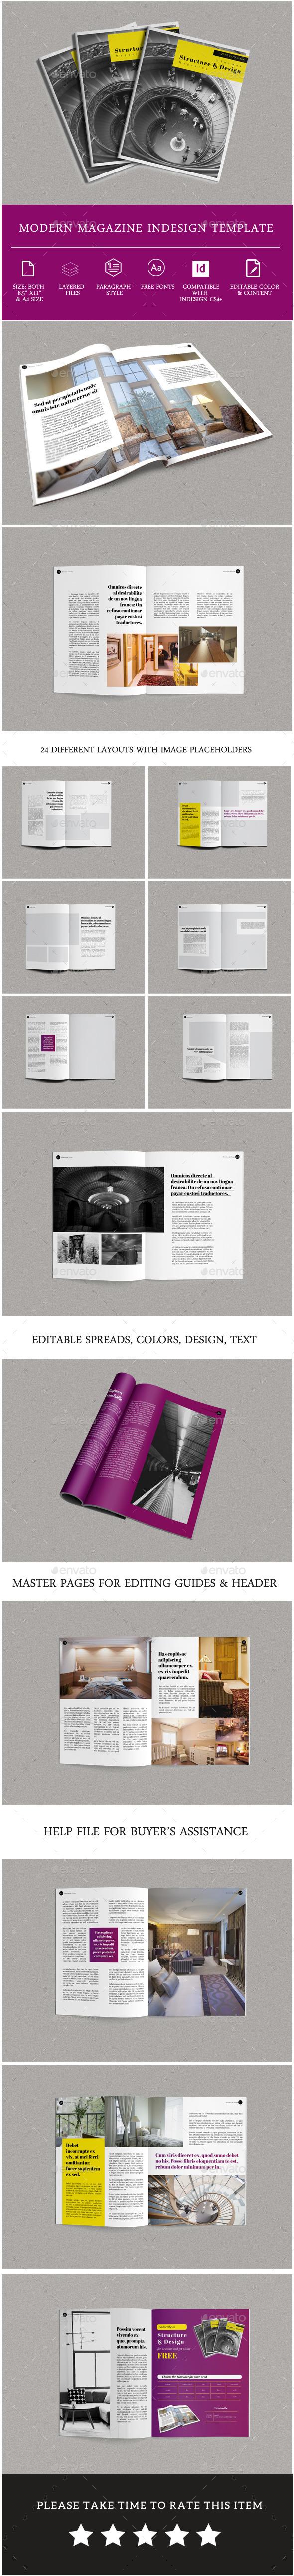 Minimal Modern Magazine Template - Magazines Print Templates